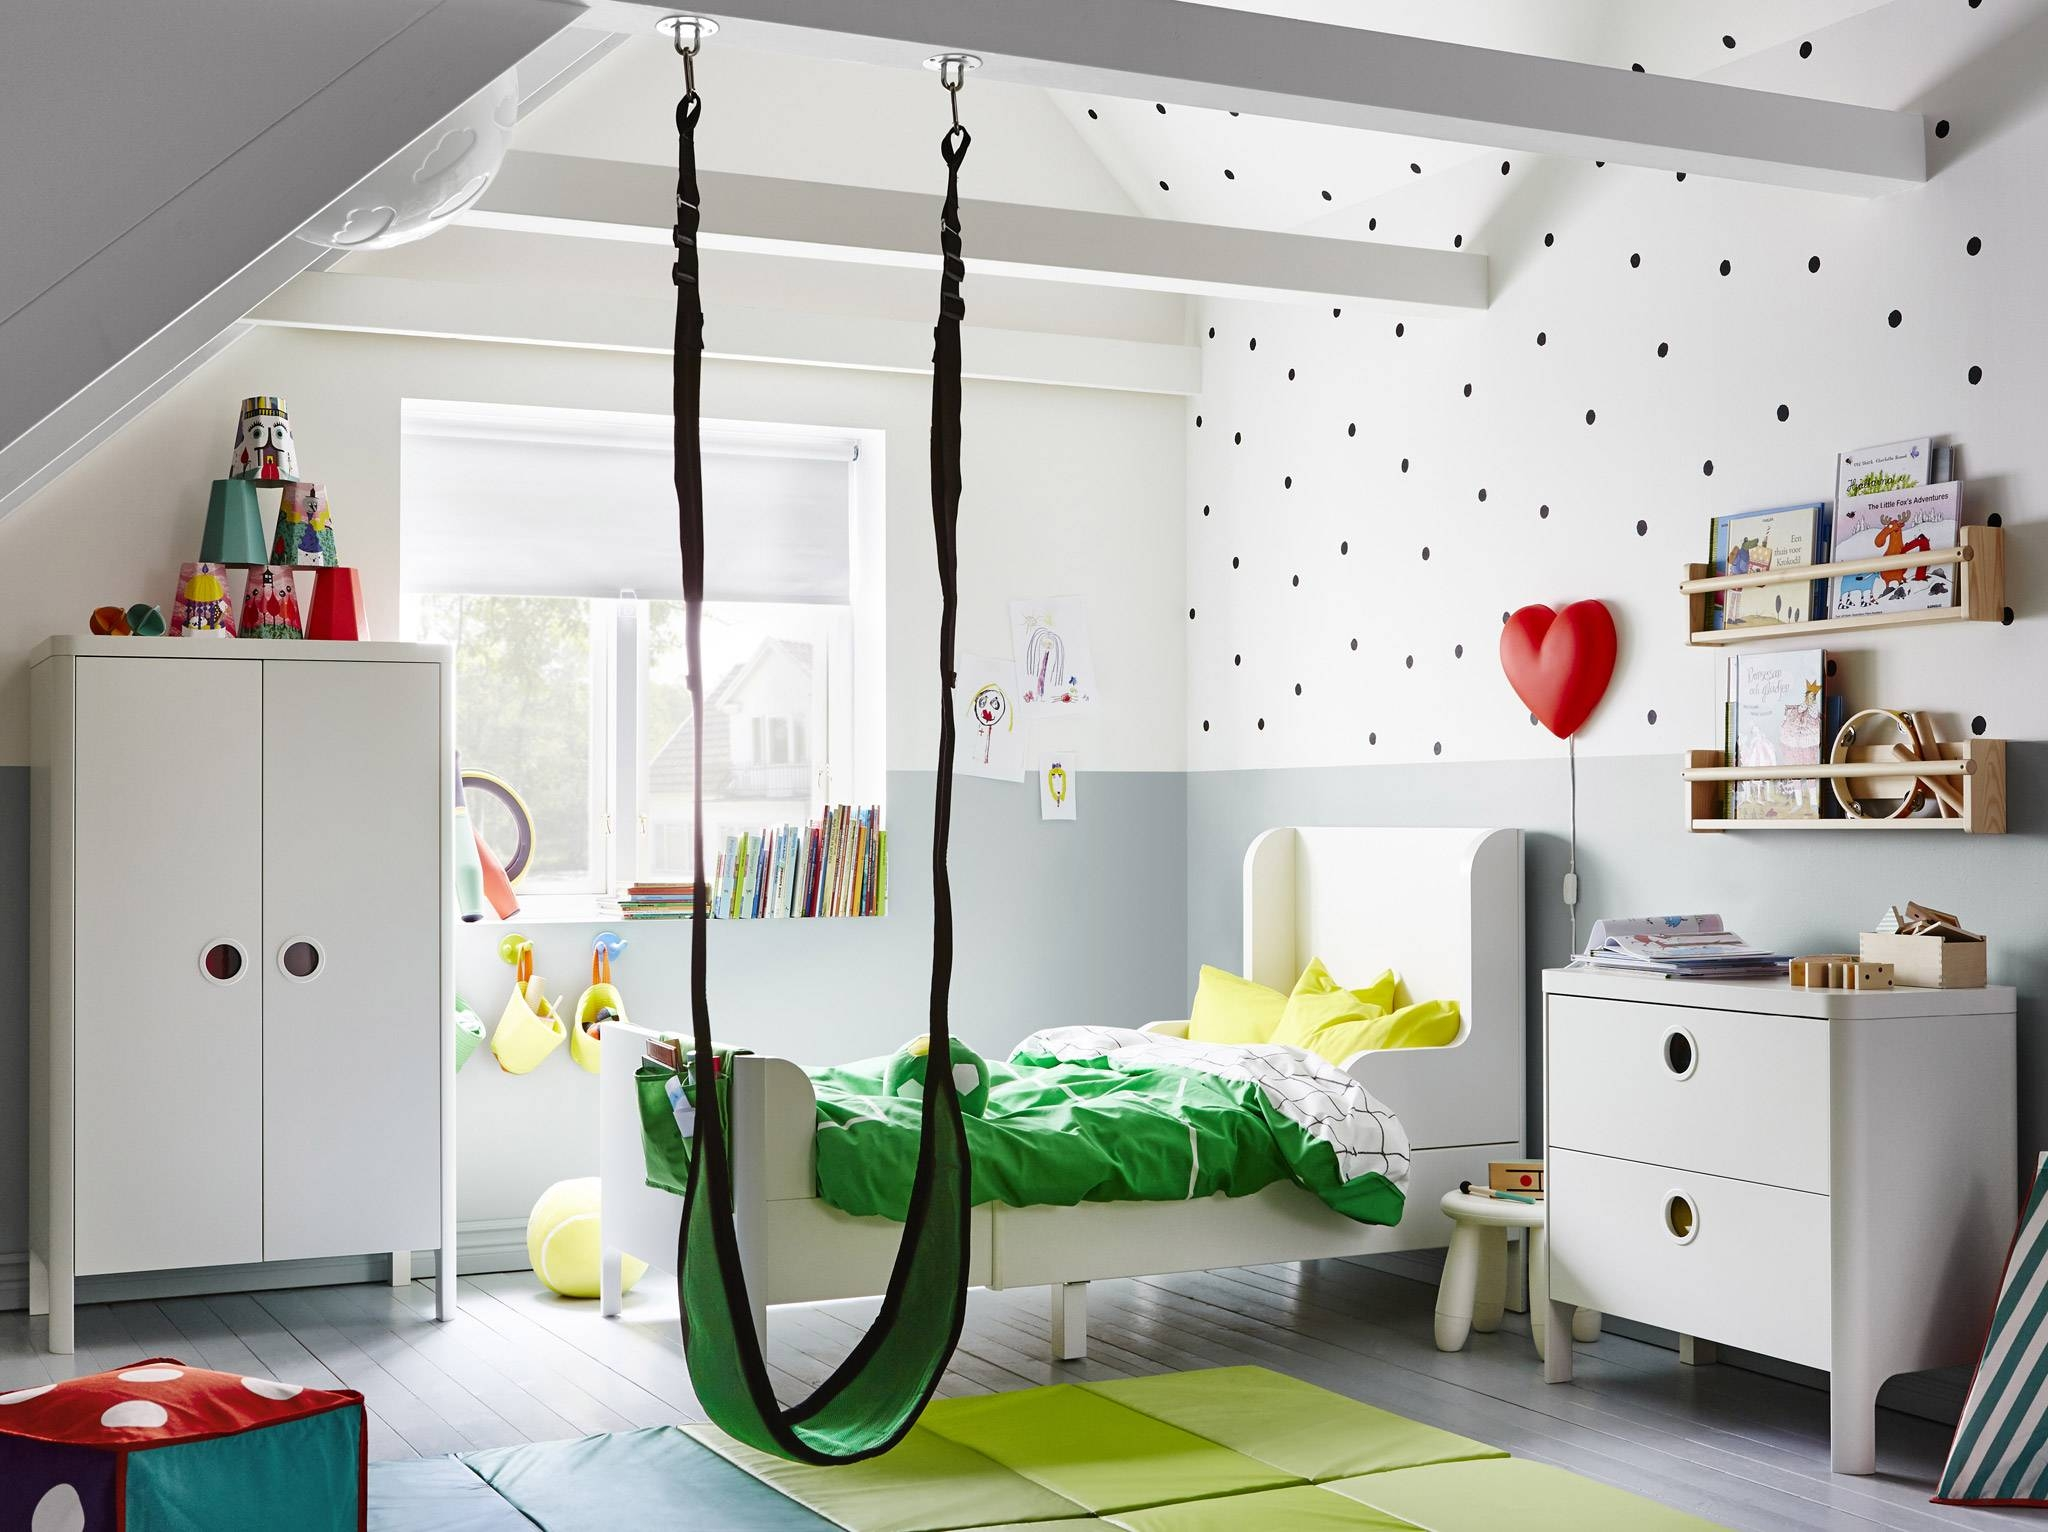 Children's Furniture & Ideas | Ikea inside Childrens Bedroom Wardrobes (Image 19 of 30)